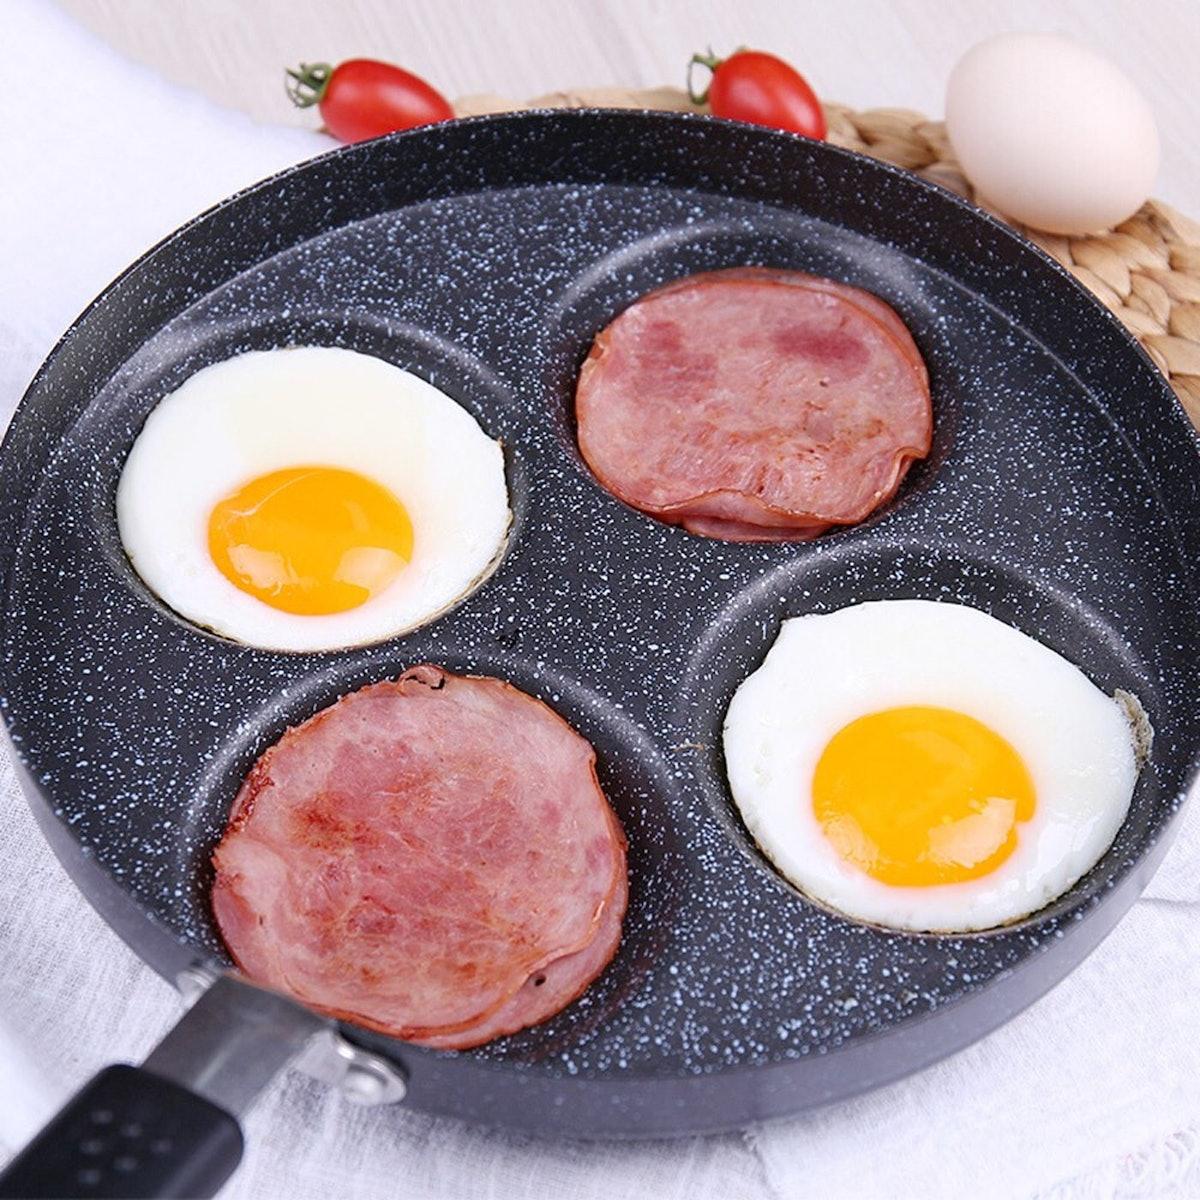 MyLifeUNIT Egg Frying Pan